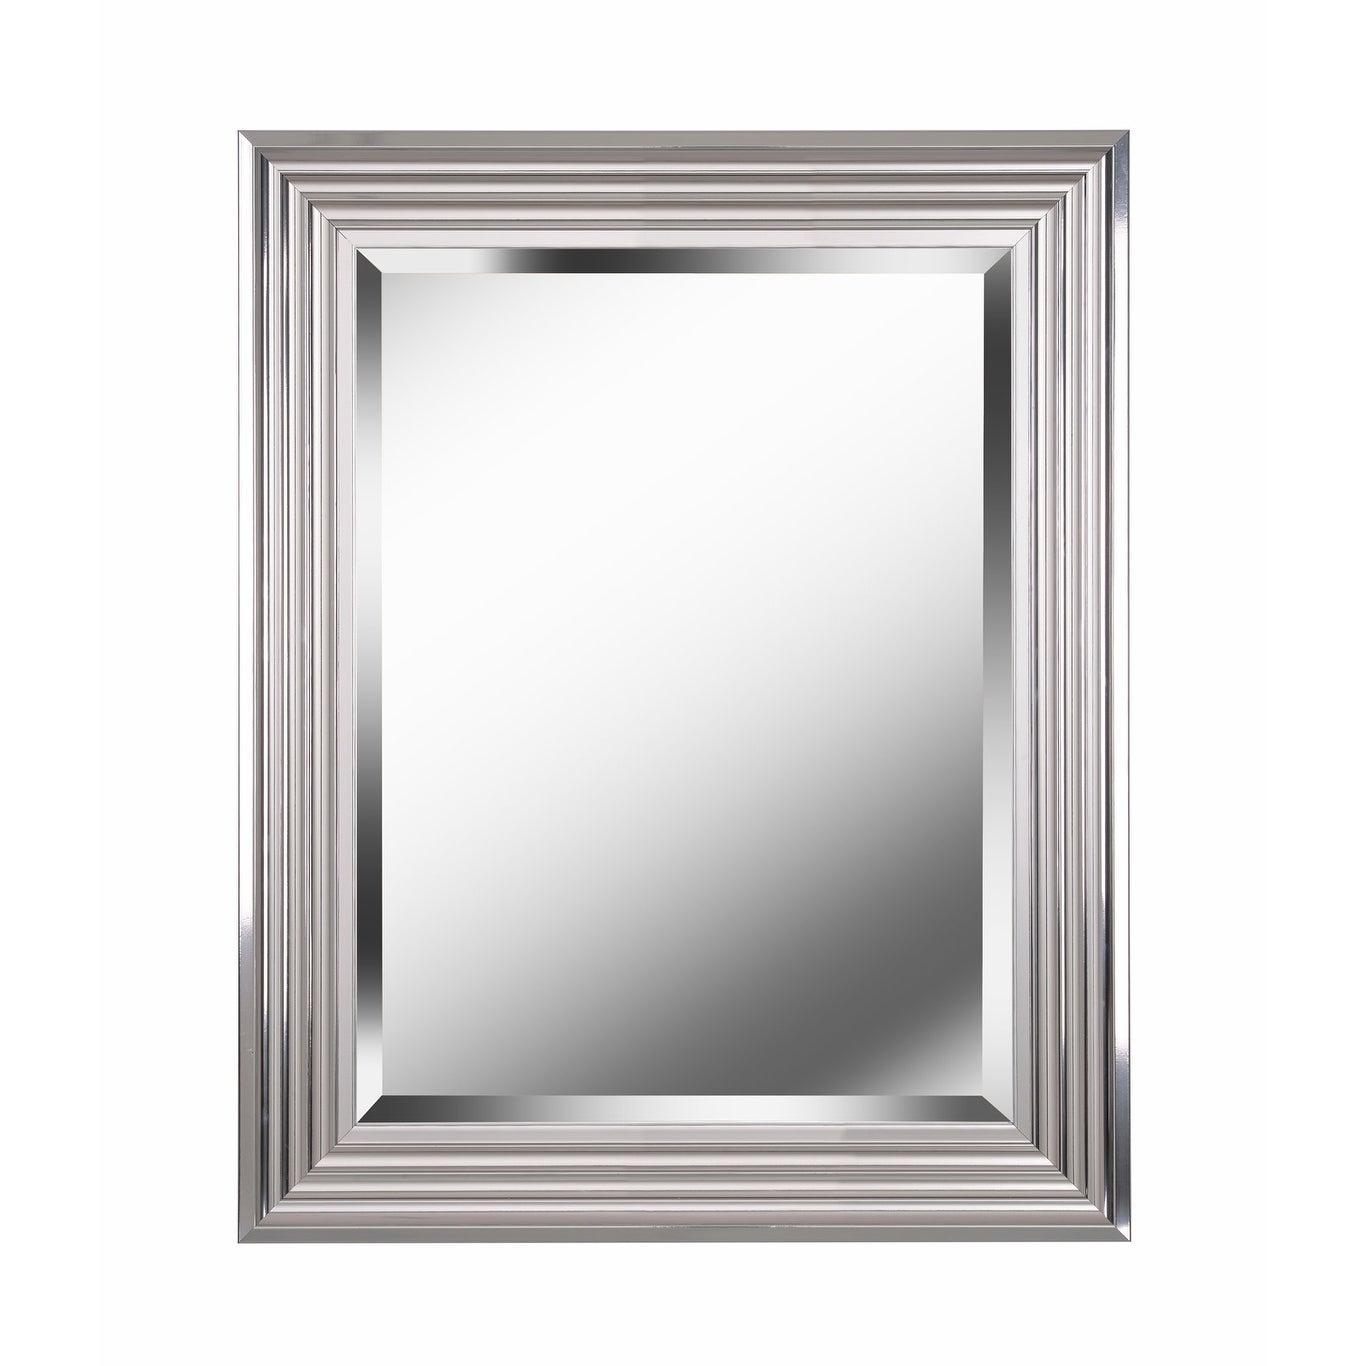 "Kenroy Home 60320 Lyonesse 30"" X 24"" Rectangular Beveled Accent Mirror For Traditional Beveled Accent Mirrors (Gallery 28 of 30)"